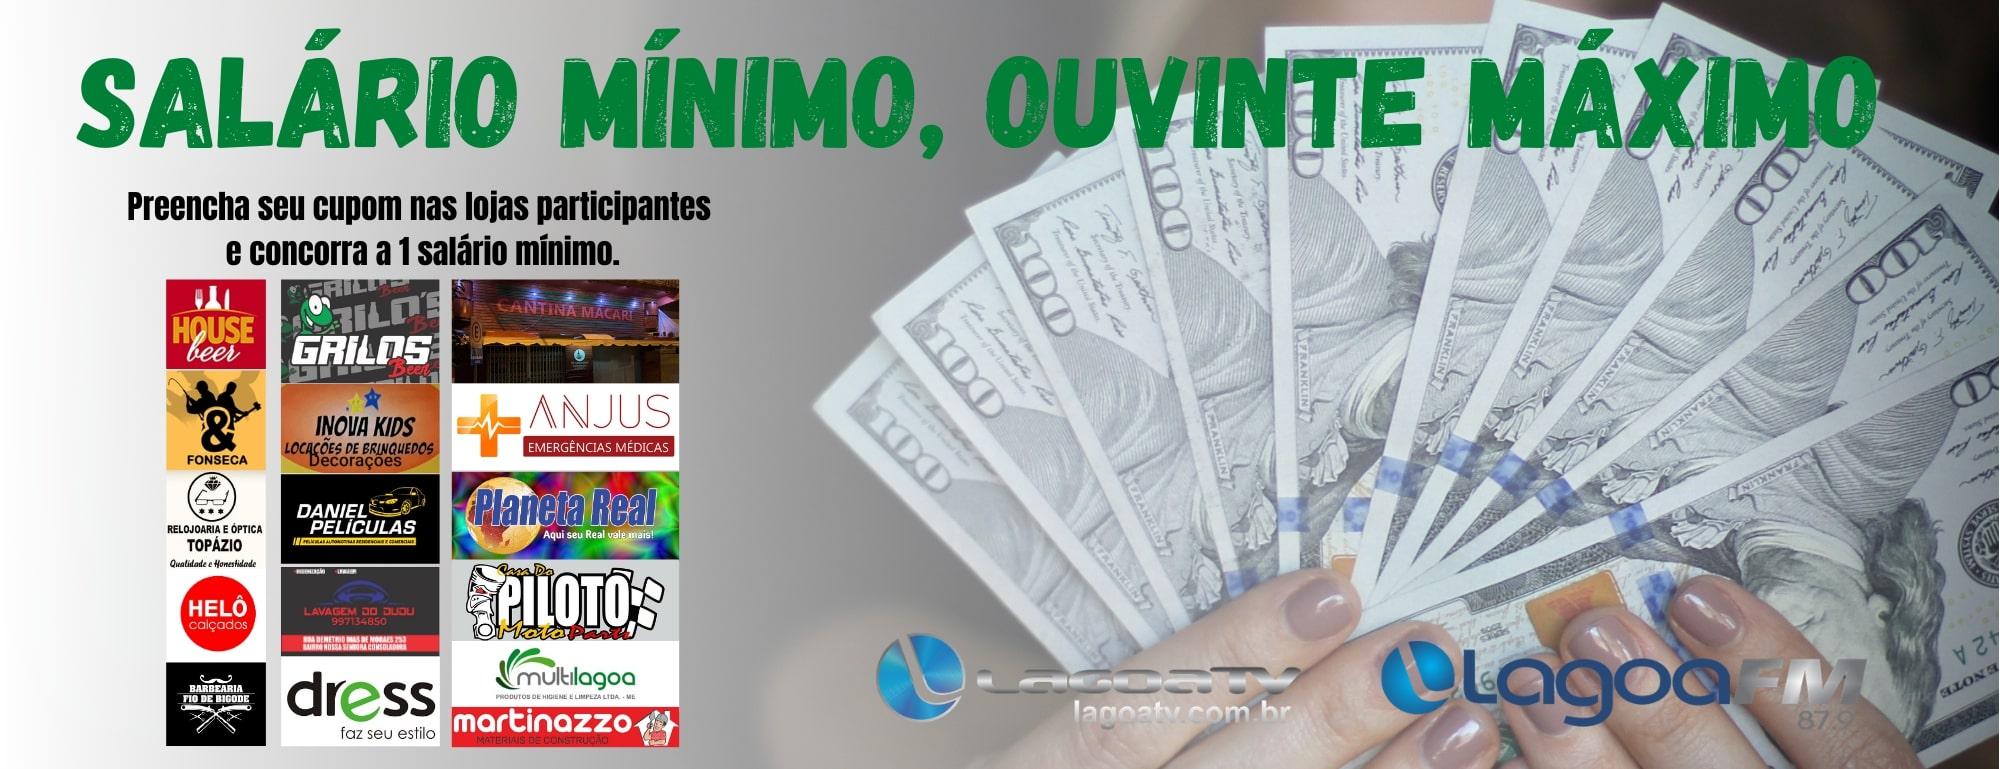 Promoção Salário Mínimo, Ouvinte Máximo!